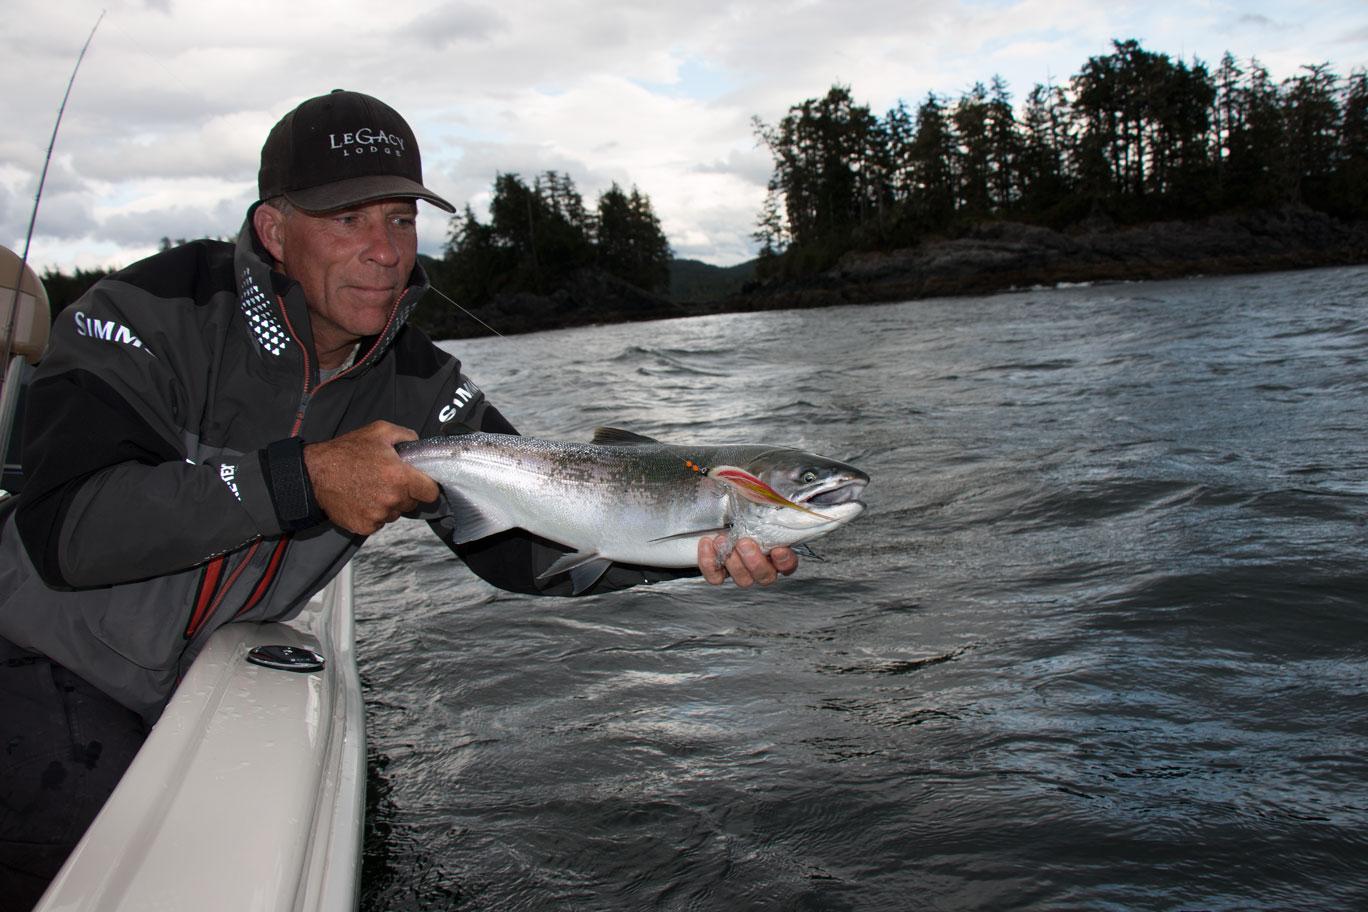 Legacy lodge 6 american angleramerican angler for Eastern fly fishing magazine